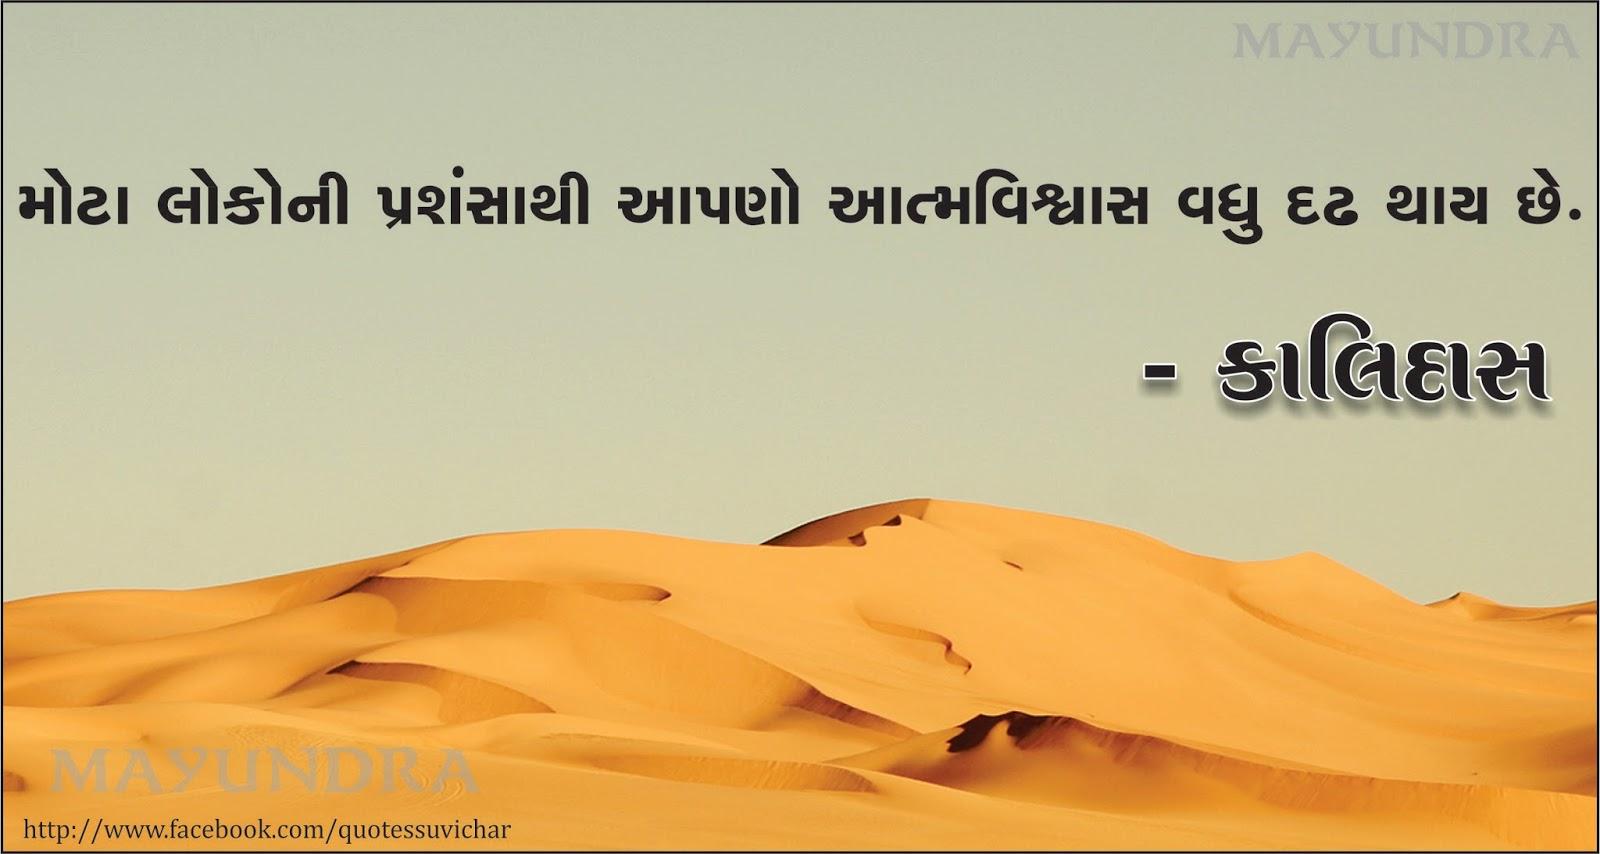 gujarati quotes kalidasa quotes india quotes health